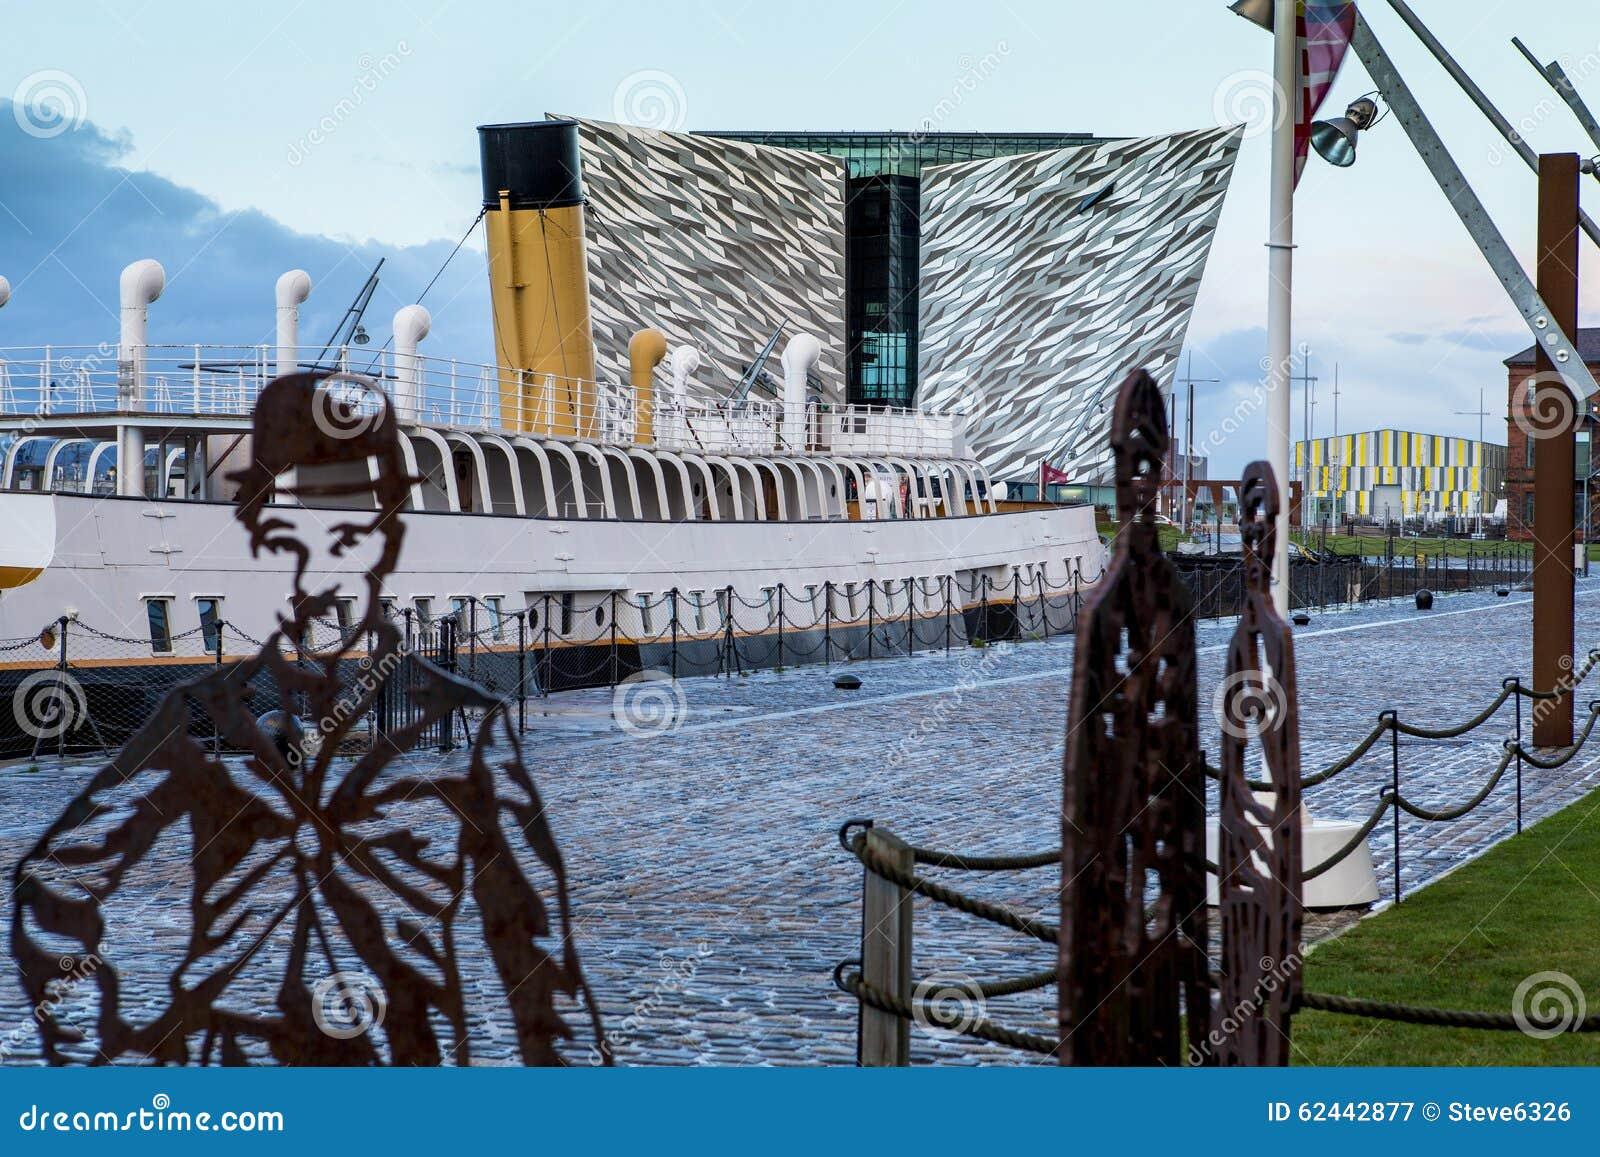 Titanic Museum, SS Nomadic, in Belfast at sunset